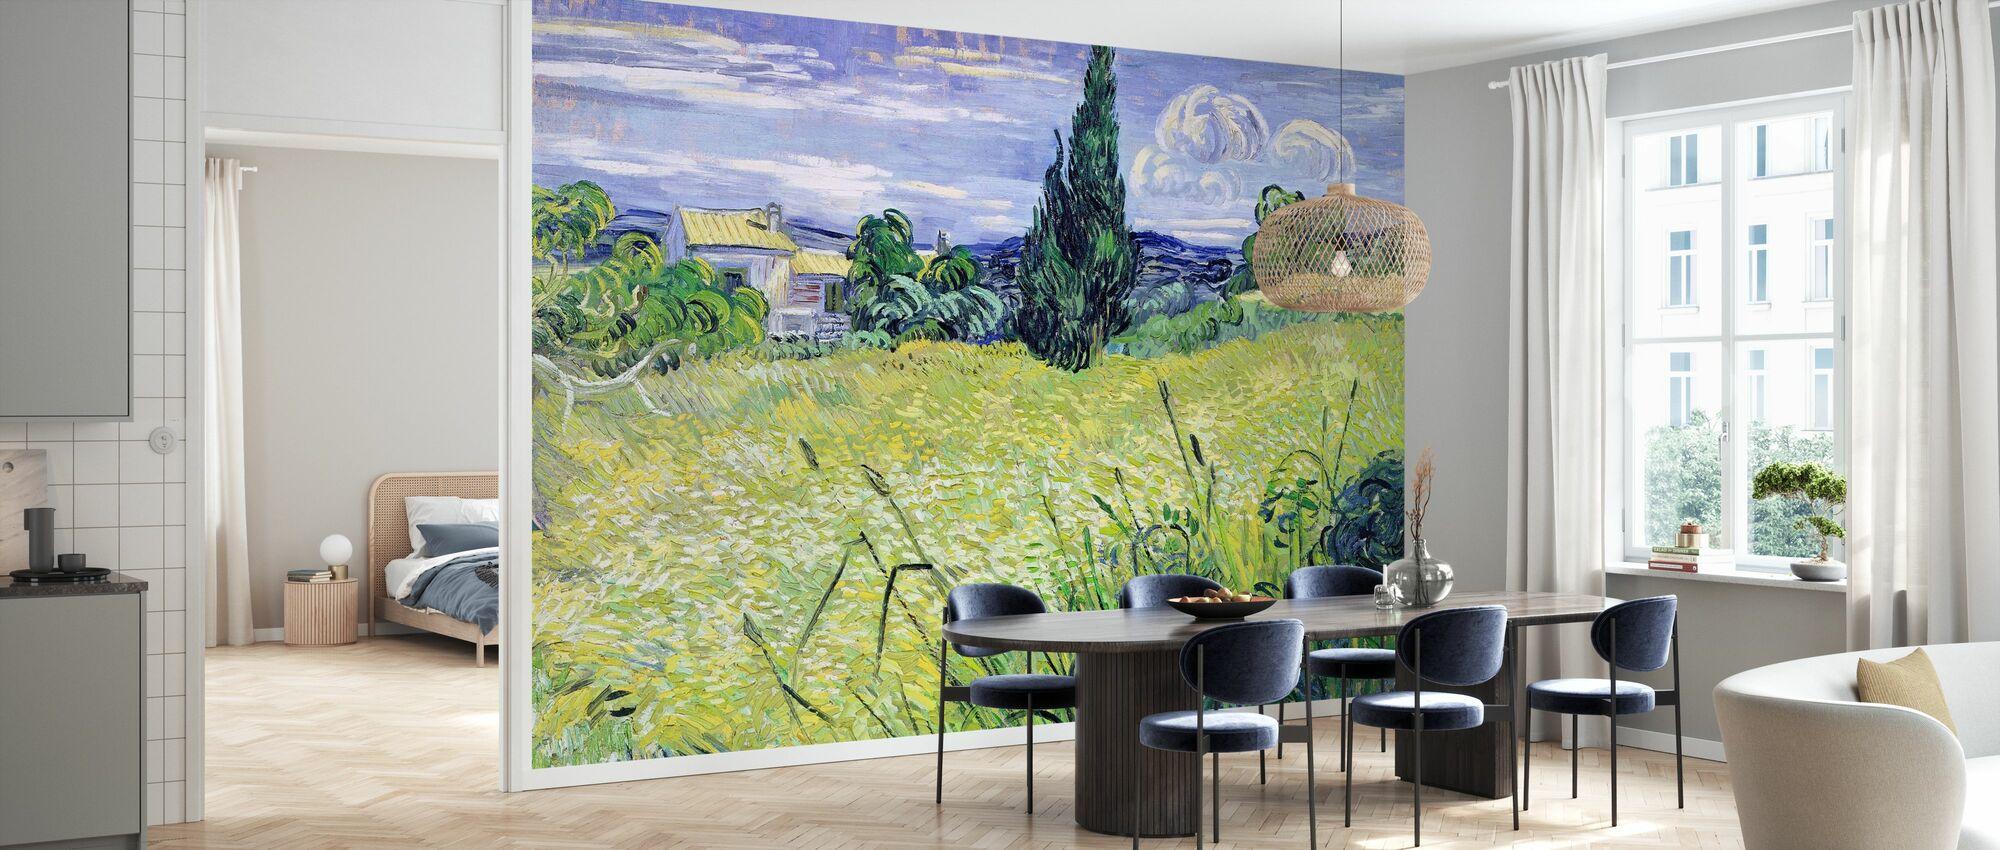 Field, Vincent van Gogh - Wallpaper - Kitchen